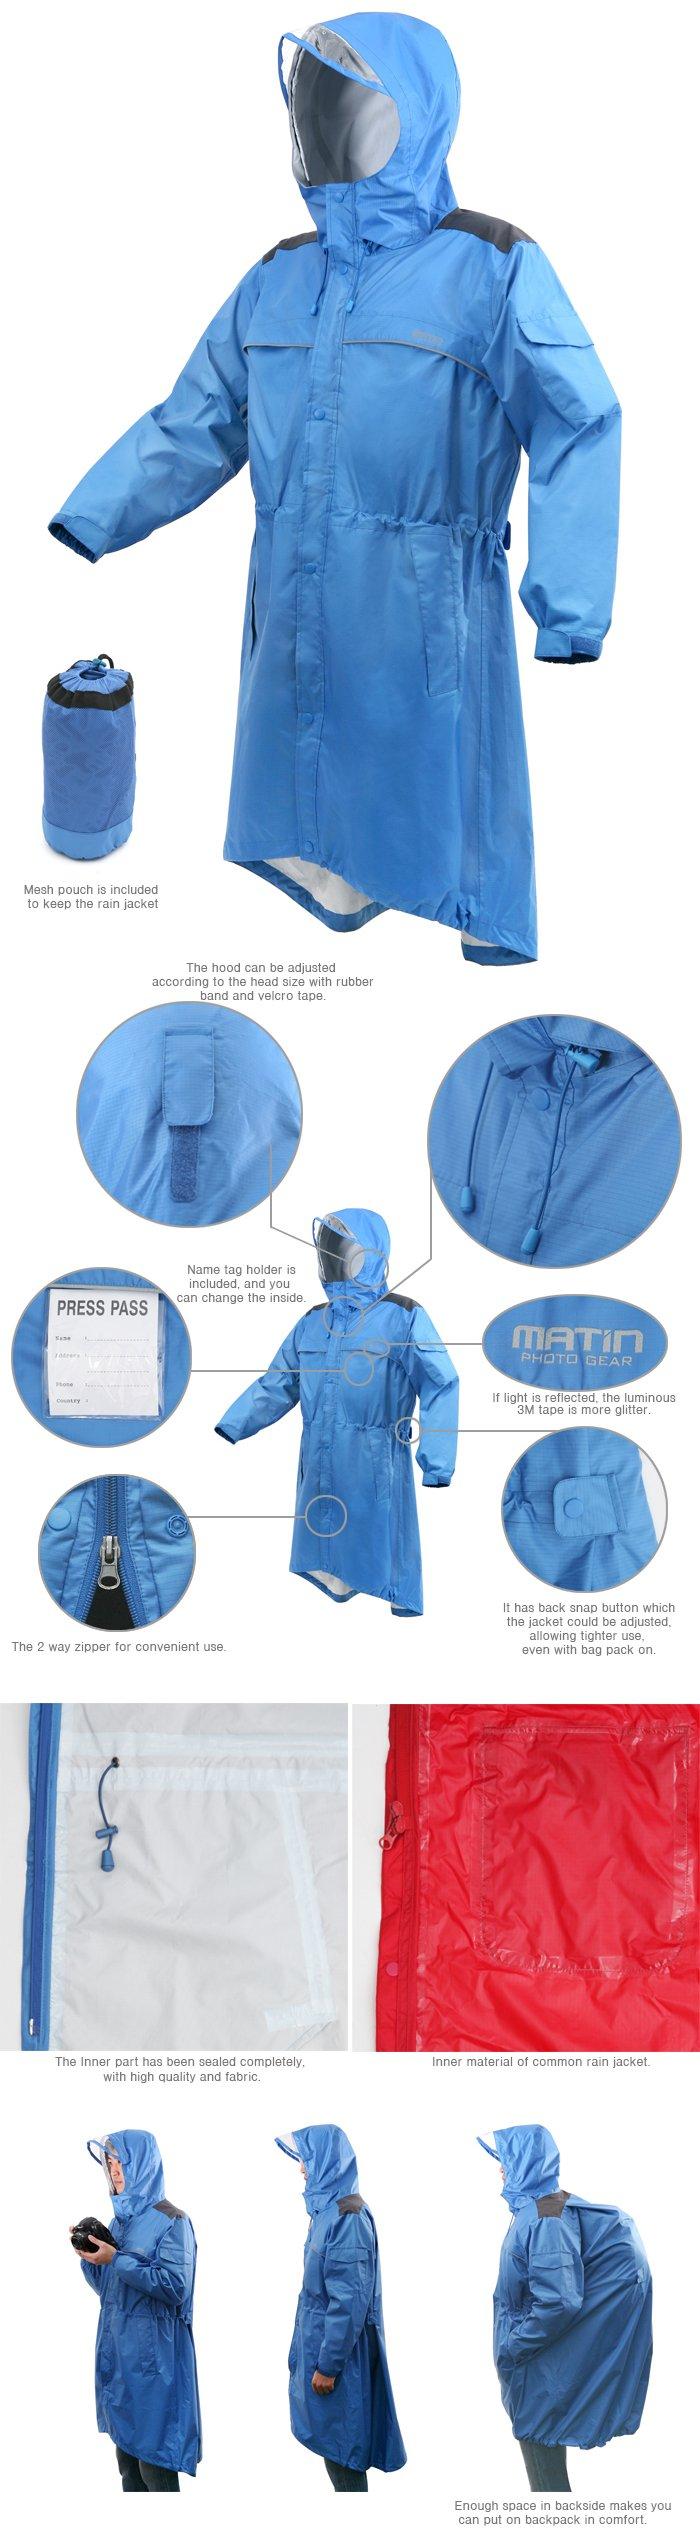 Matin Rain wind Jacket for Professional Photographers - Large